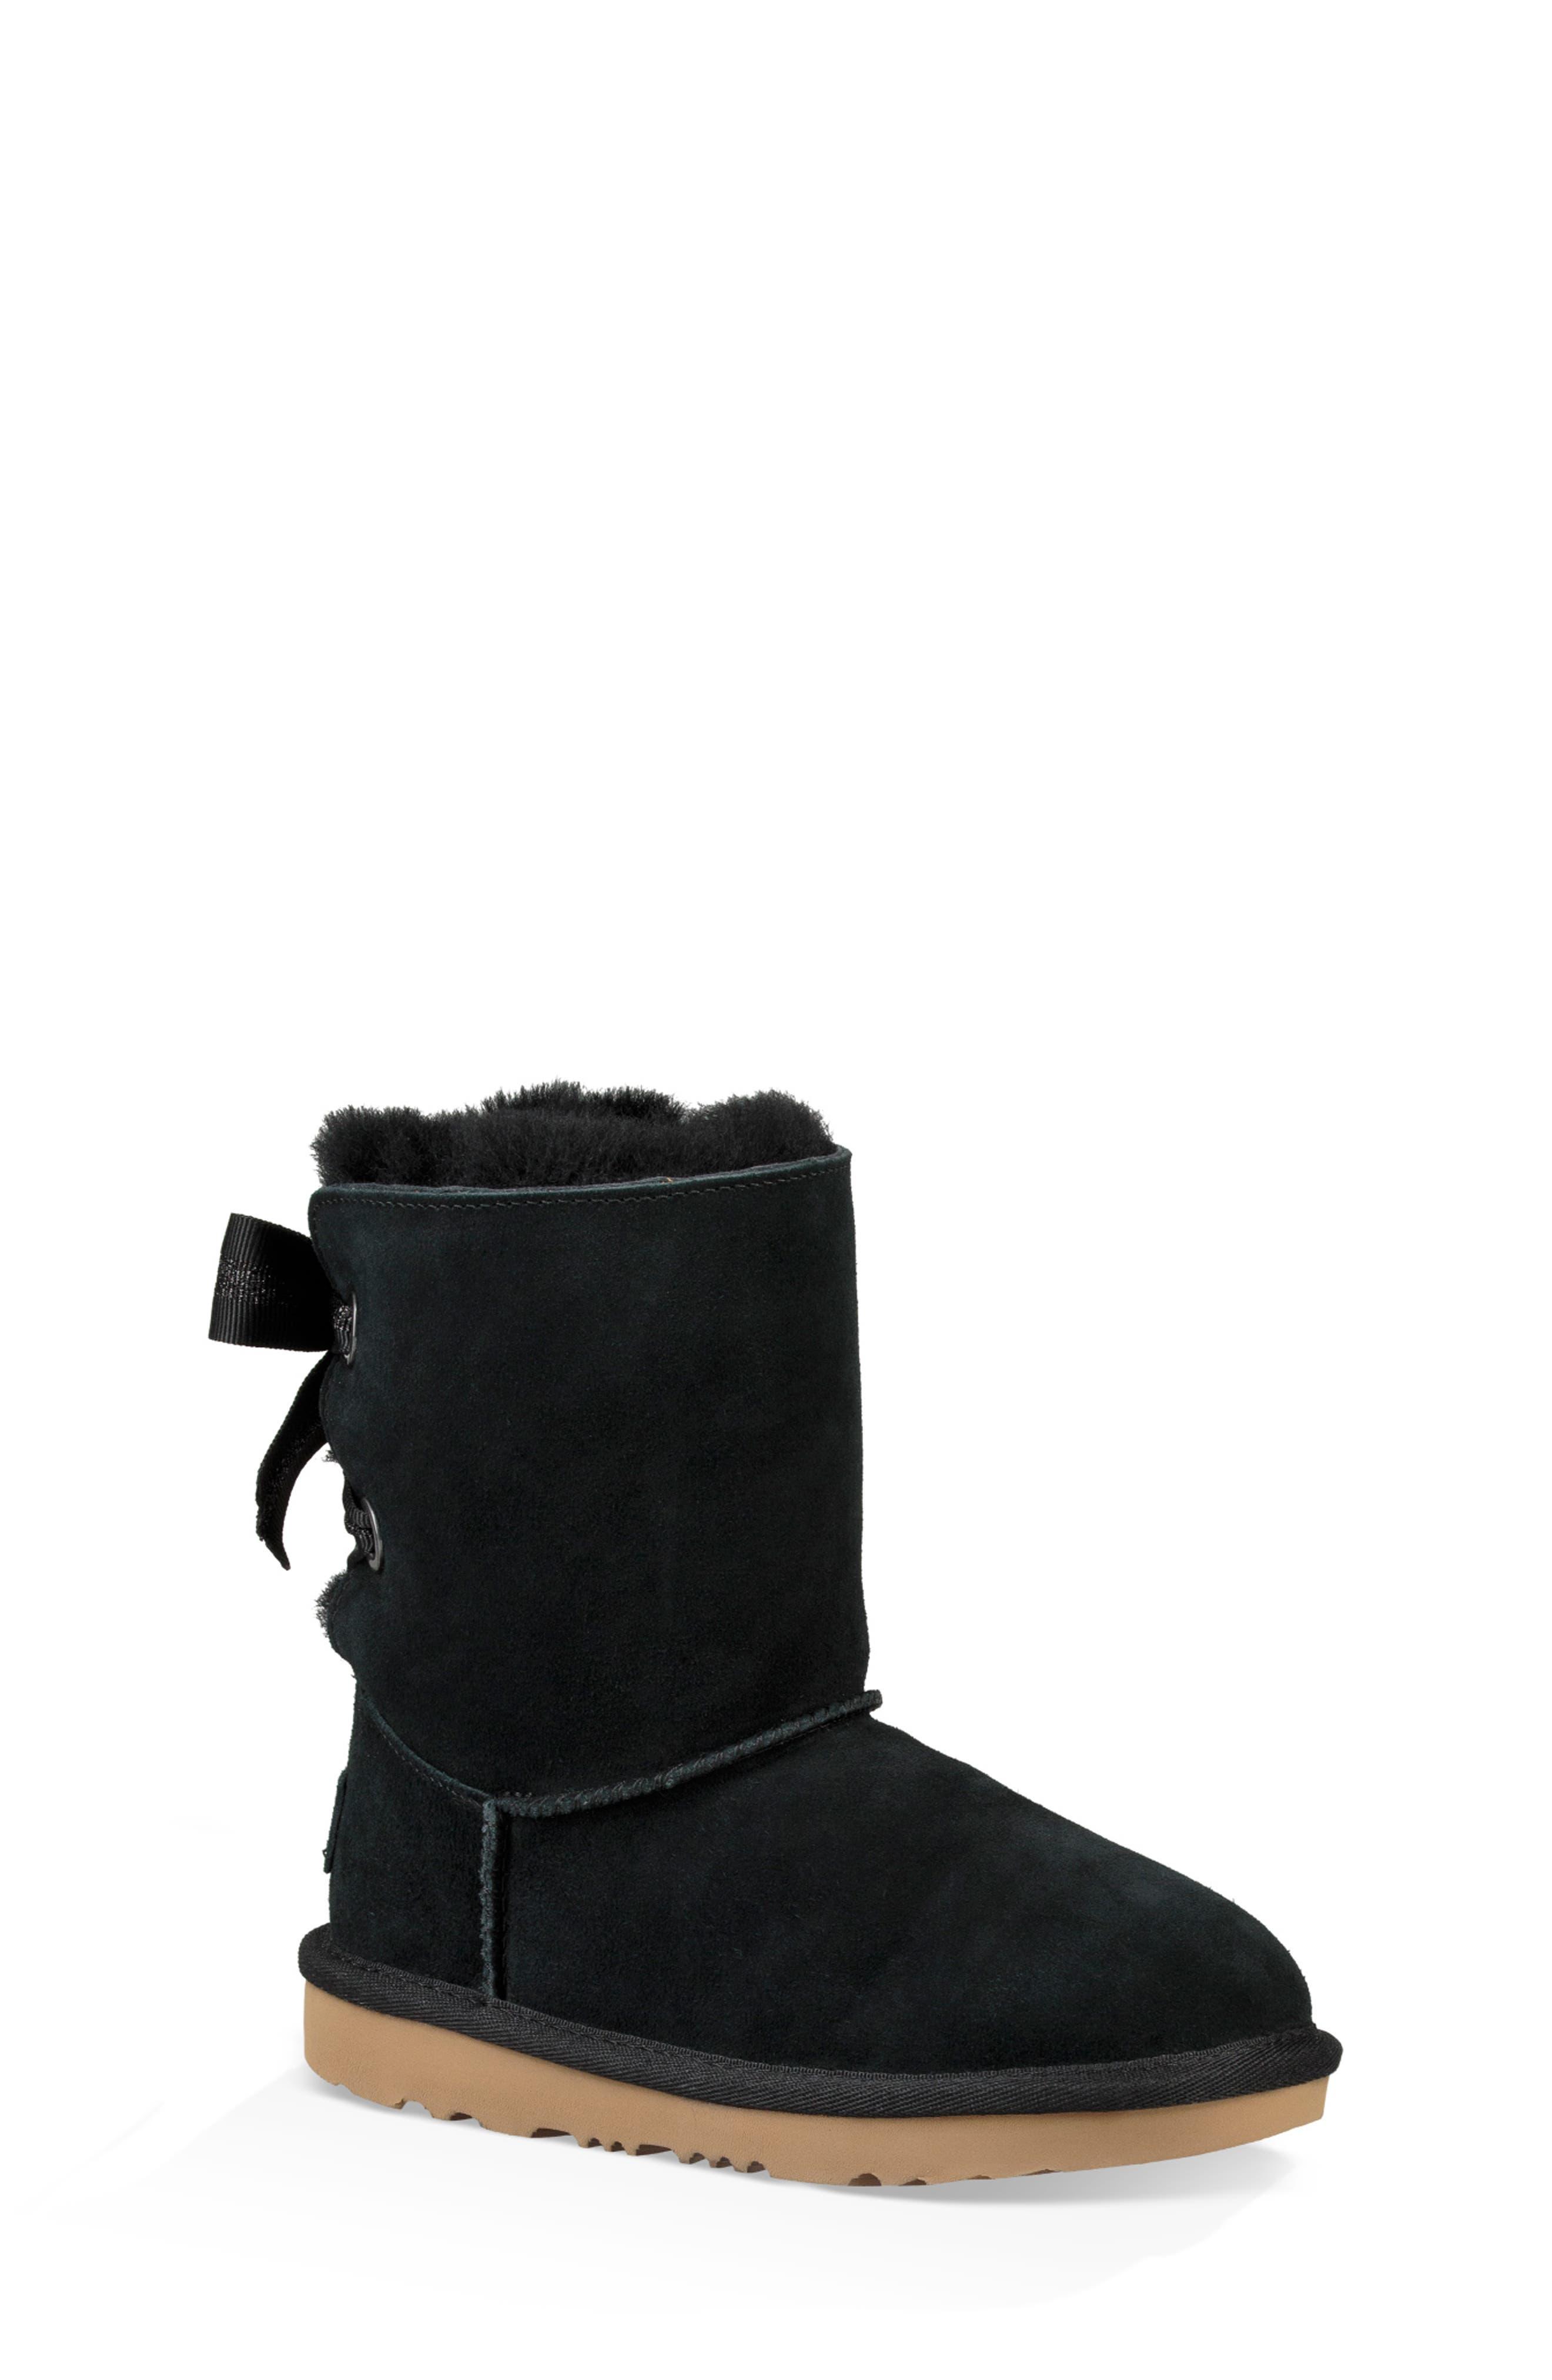 UGG<SUP>®</SUP>, Customizable Bailey Bow II Genuine Shearling Boot, Main thumbnail 1, color, BLACK